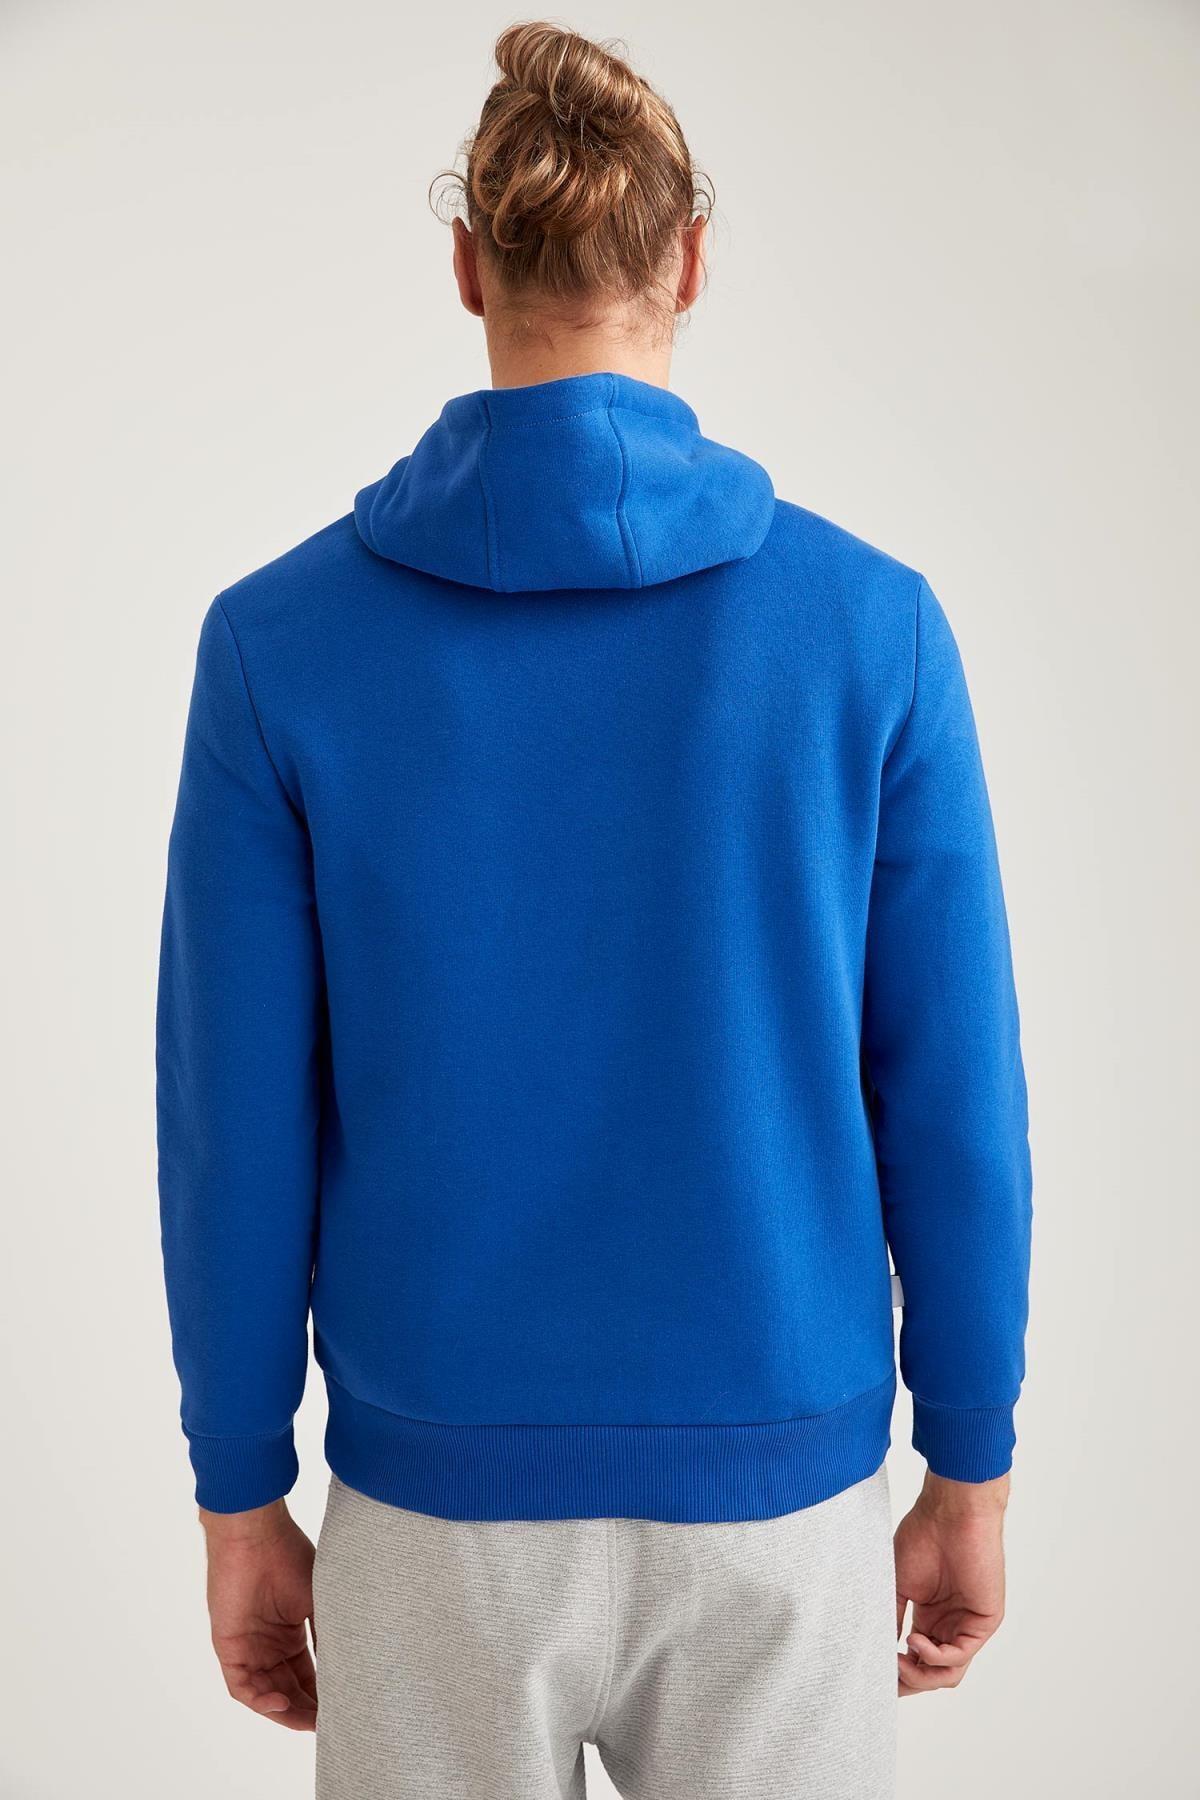 Defacto Fit Erkek Nba Lisanslı Unisex Kapüşonlu Slim Fit Sweatshirt 3